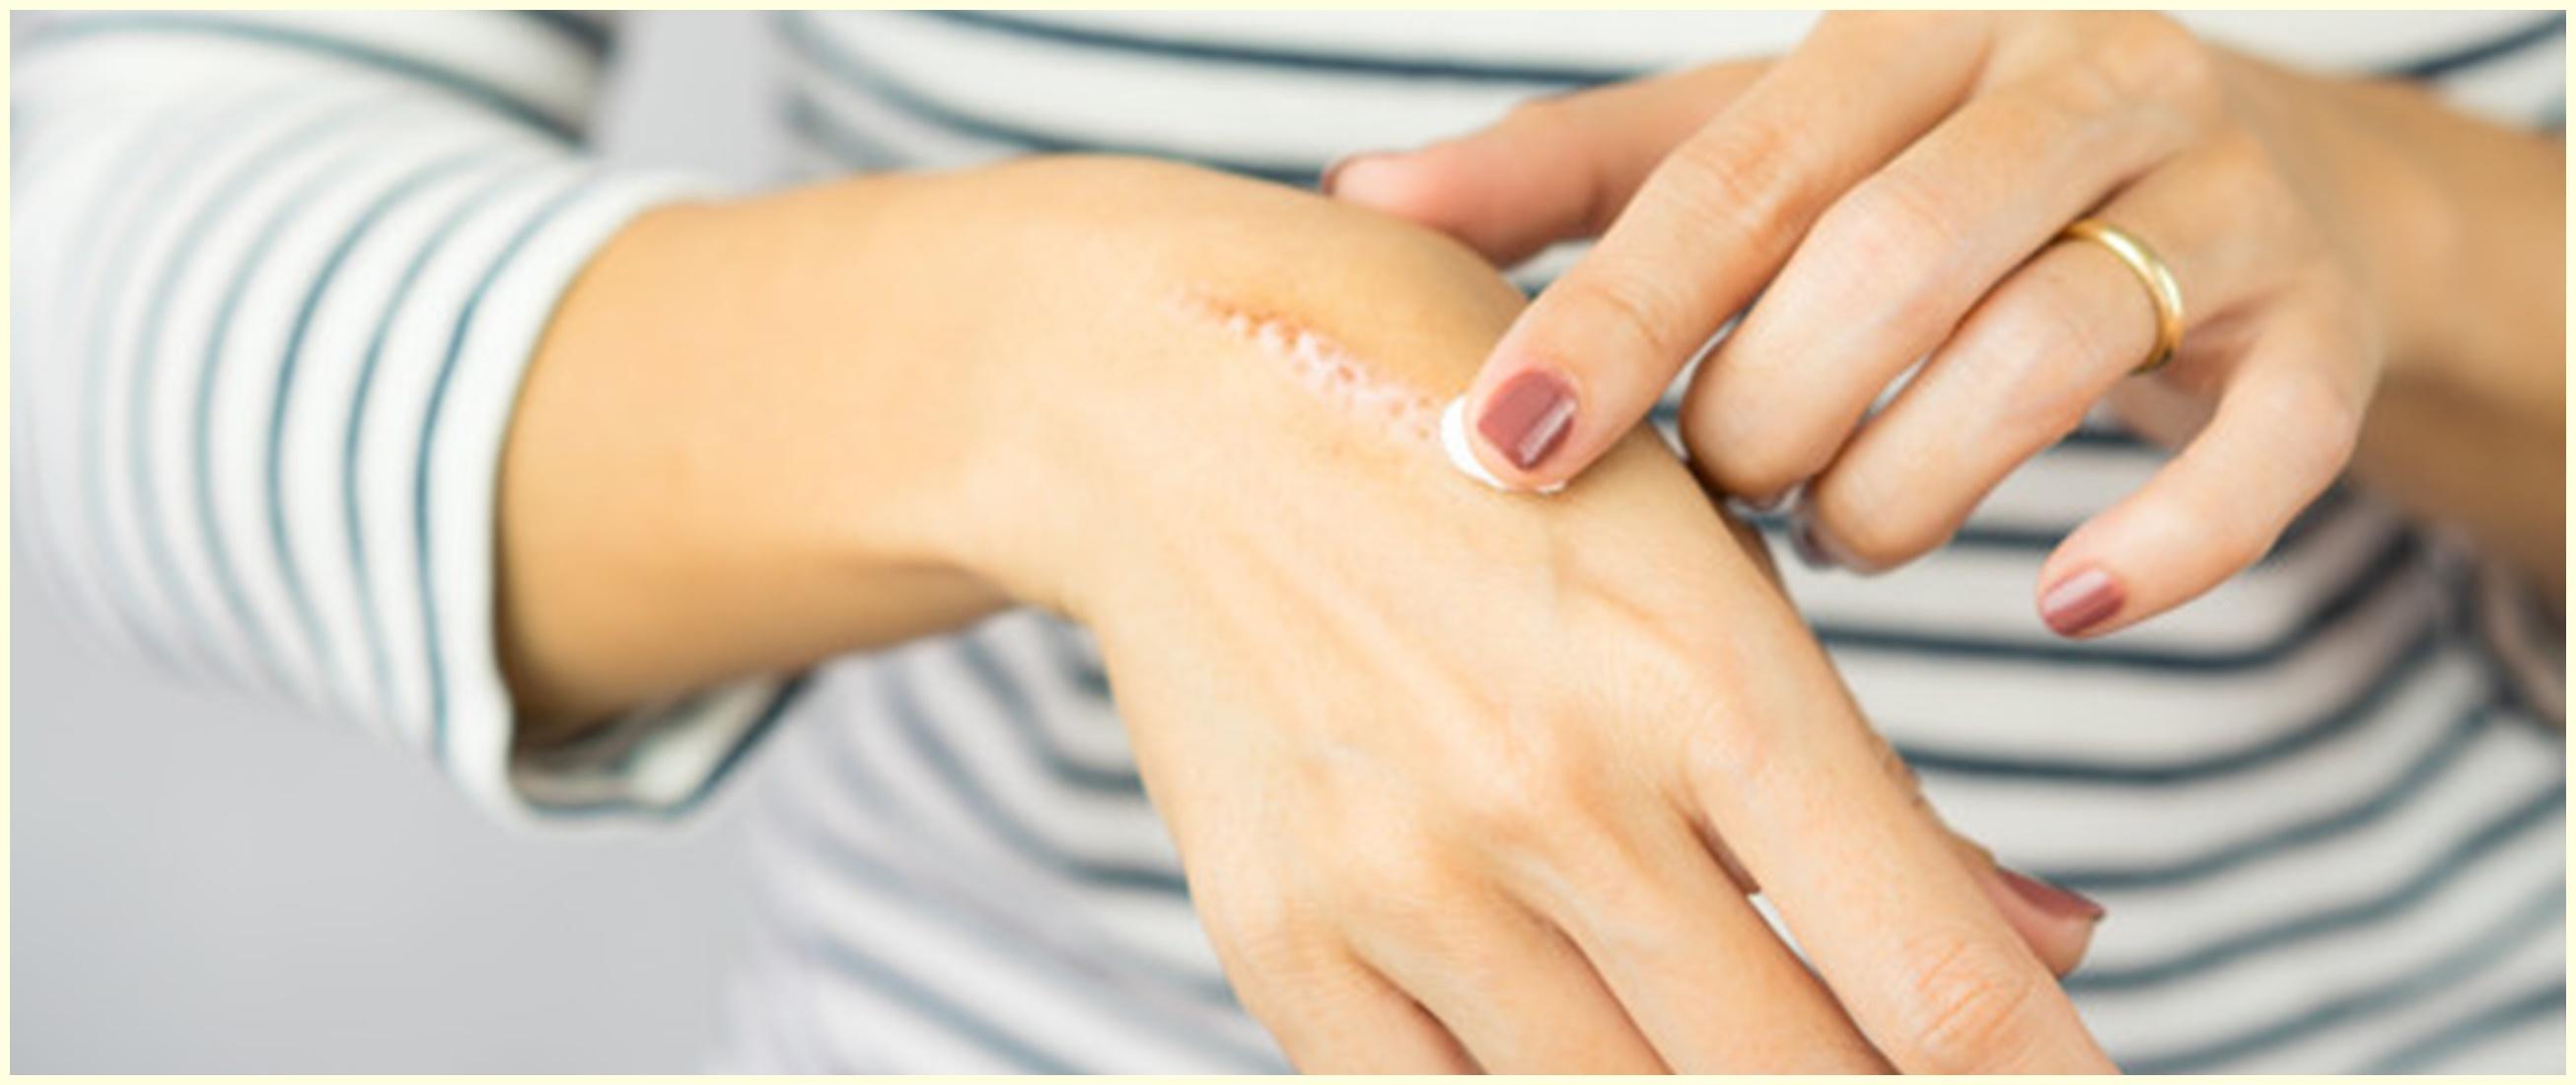 7 Cara menghilangkan bekas luka yang menghitam dengan bahan alami